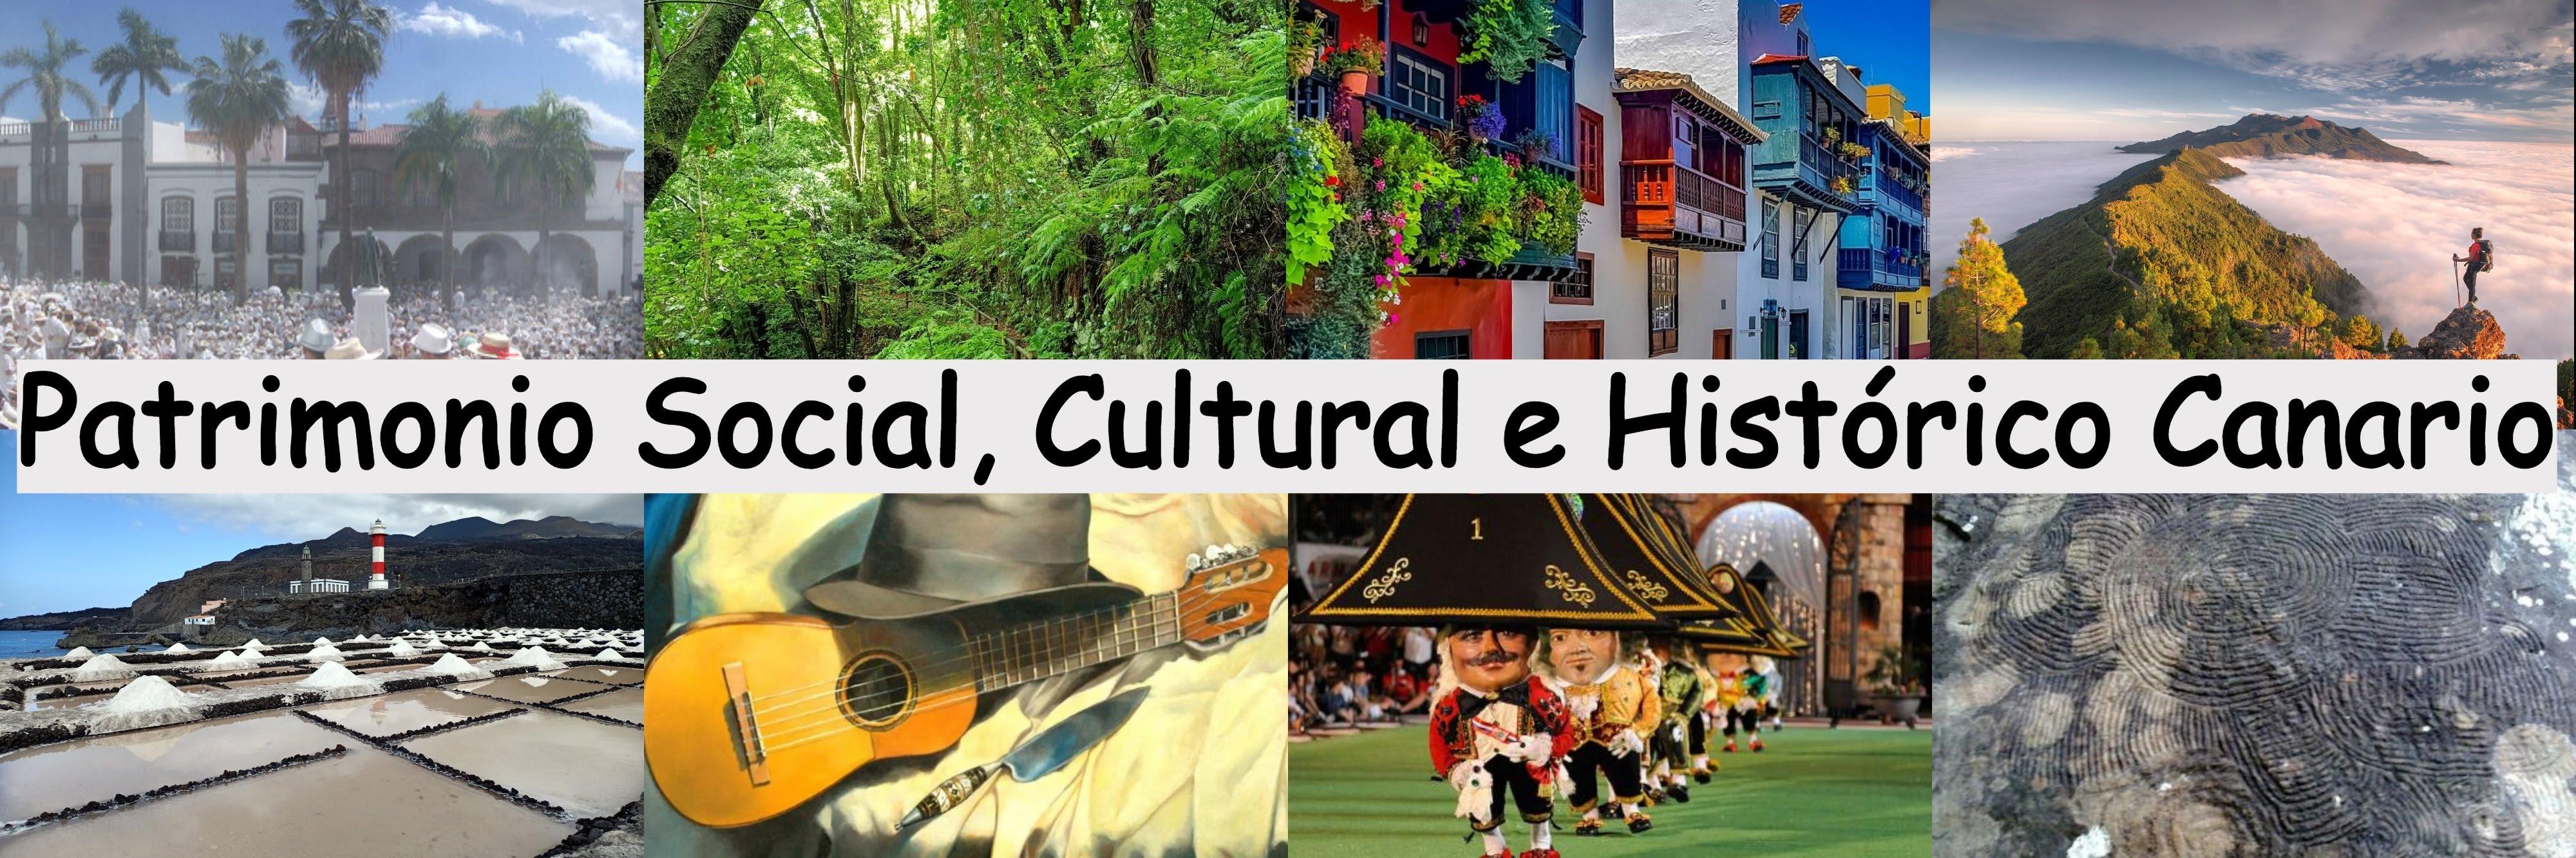 Patrimonio Social, Cultural e Histórico Canario